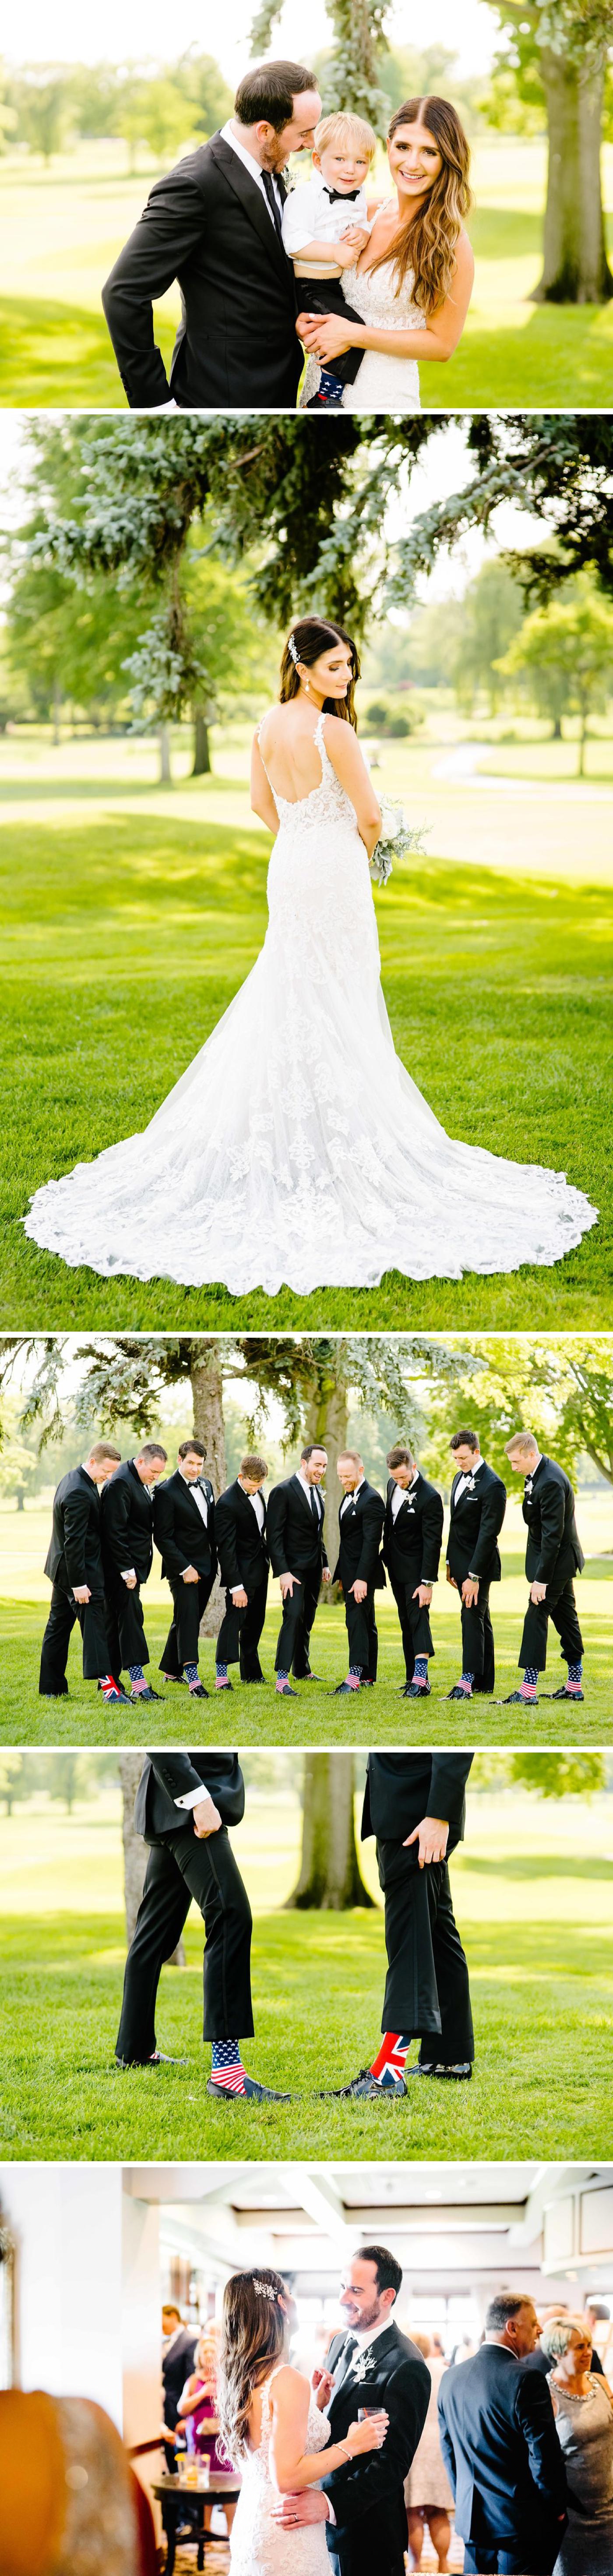 chicago-fine-art-wedding-photography-duncan73